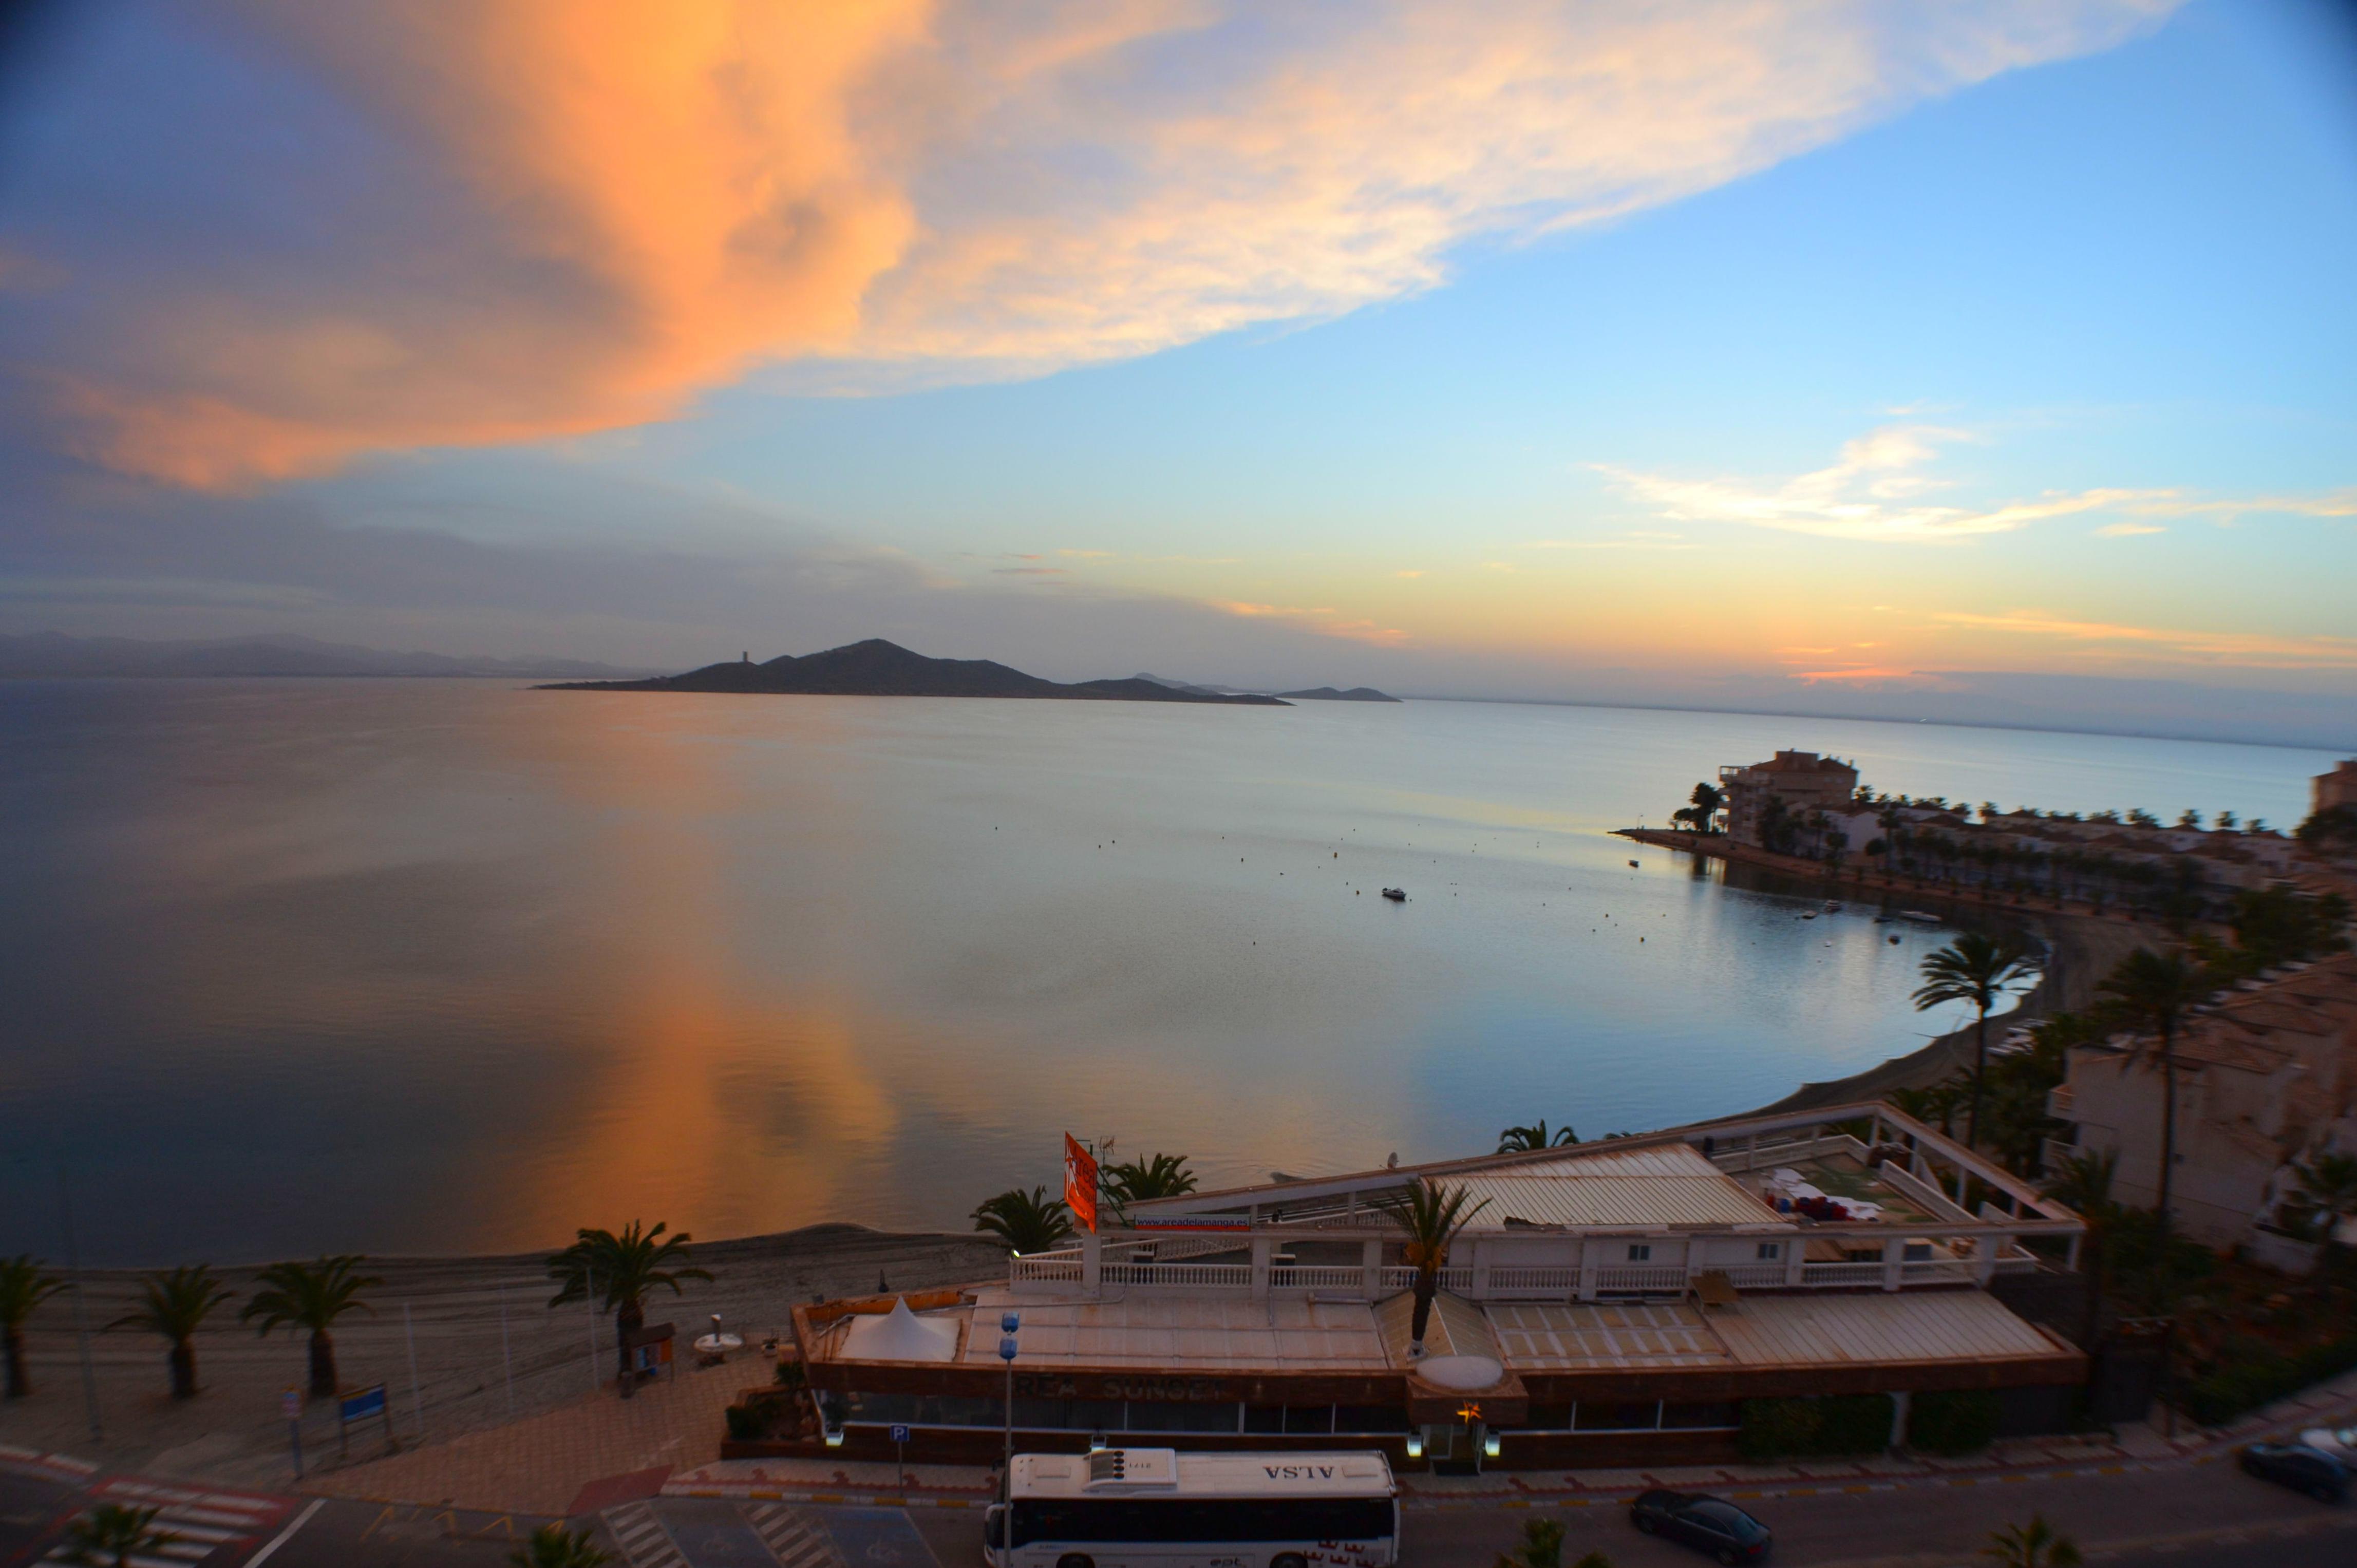 Foto 9 de Cocina mediterránea en La Manga del Mar Menor | ÁREA SUNSET